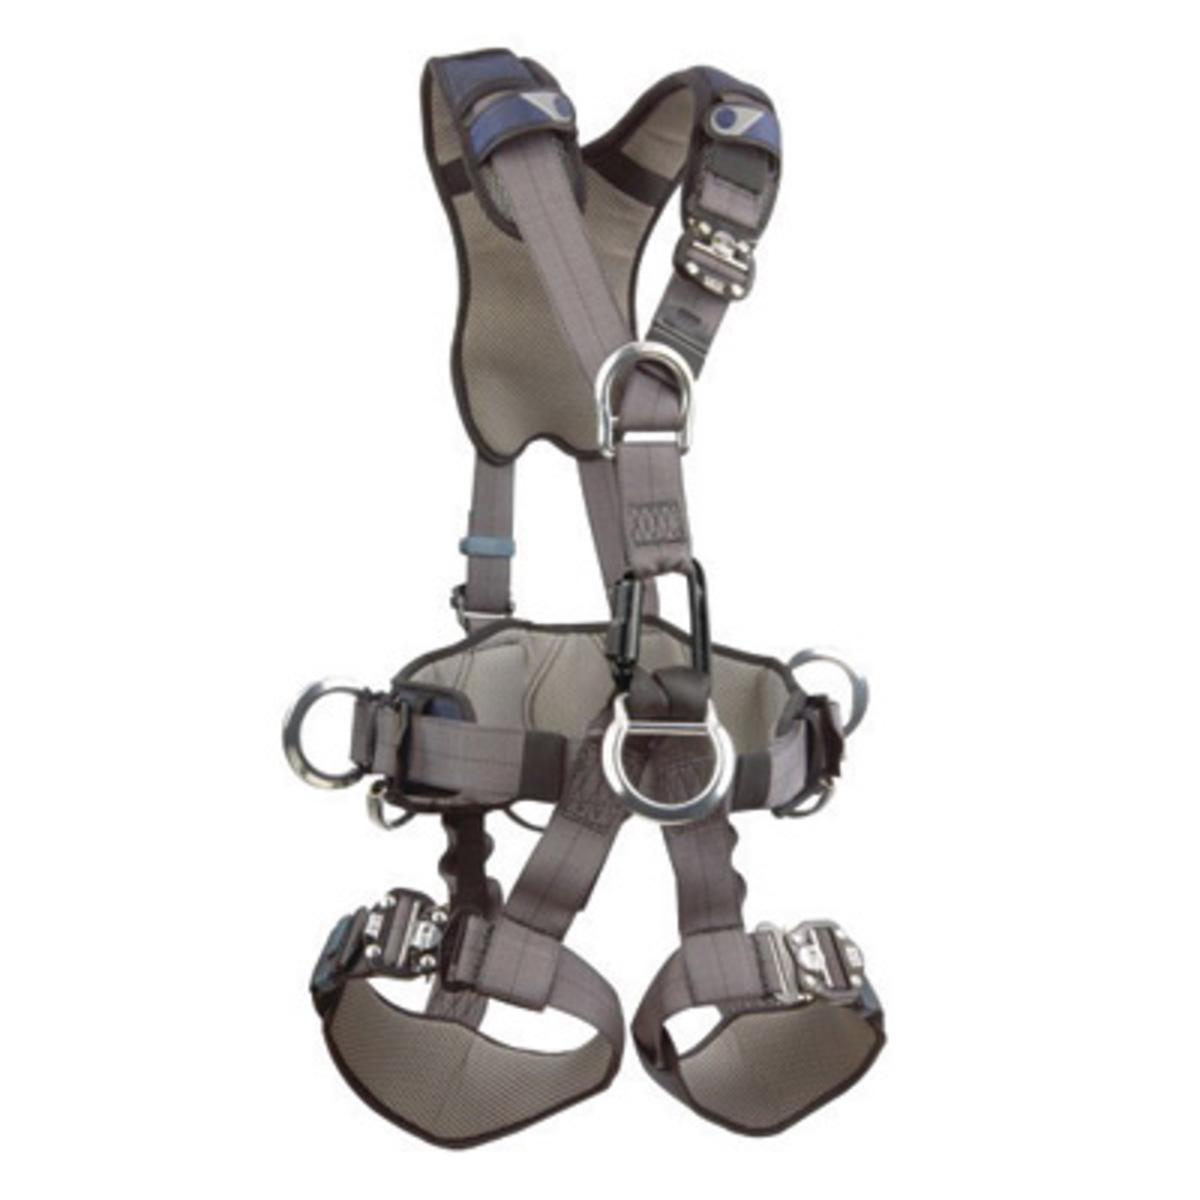 3M™ DBI-SALA® Small ExoFit NEX™ Full Body Style Harness With Back